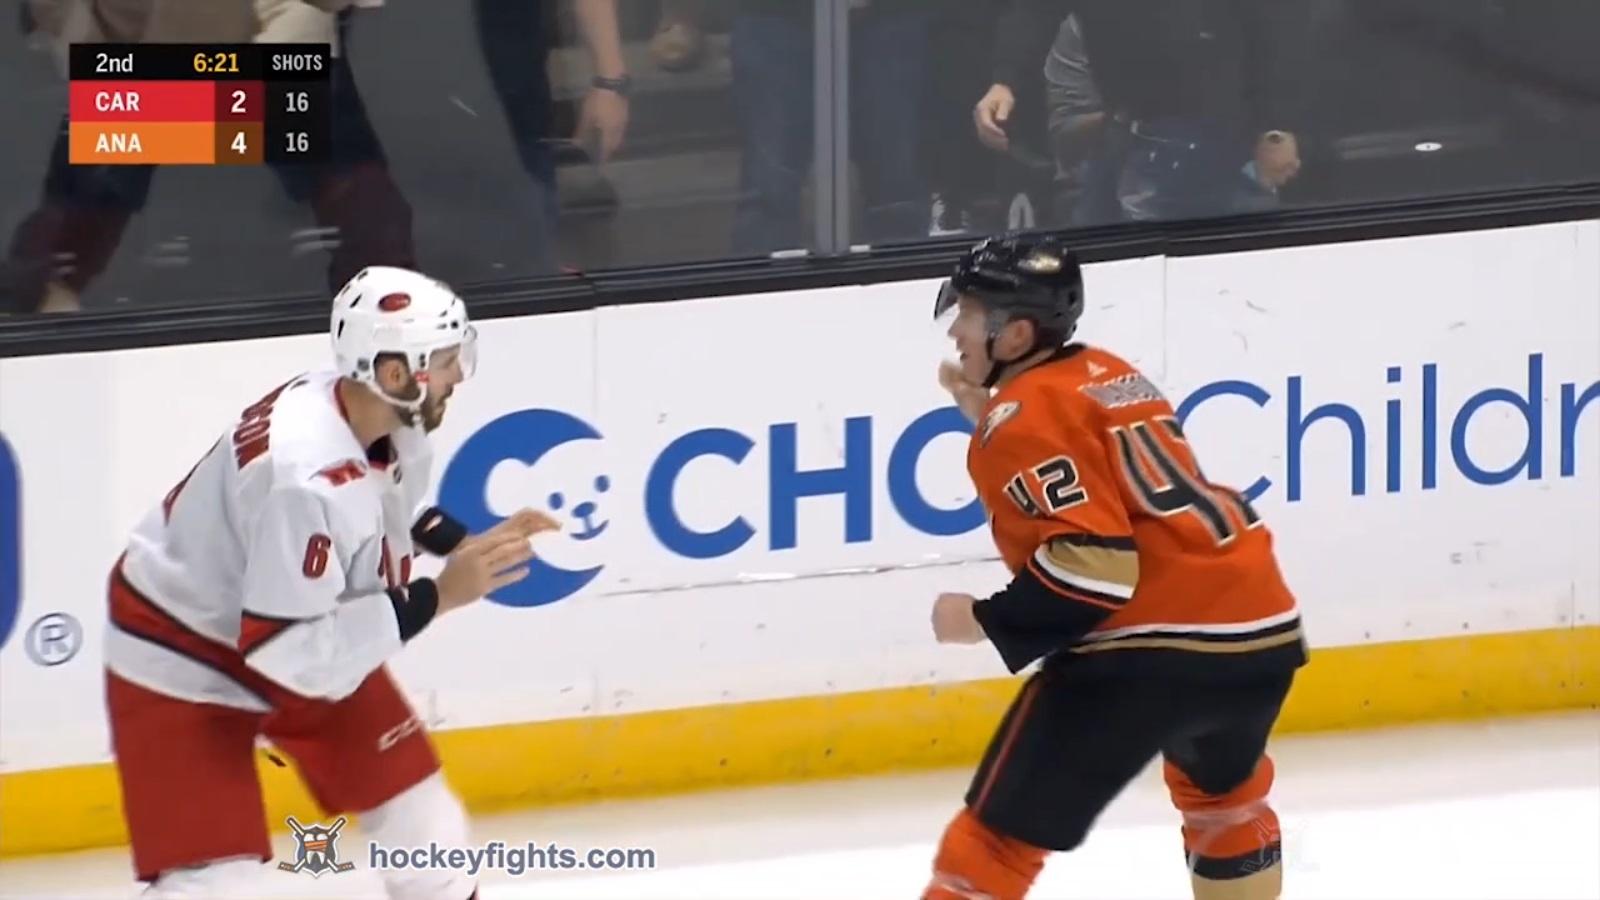 Josh Manson vs. Joel Edmundson